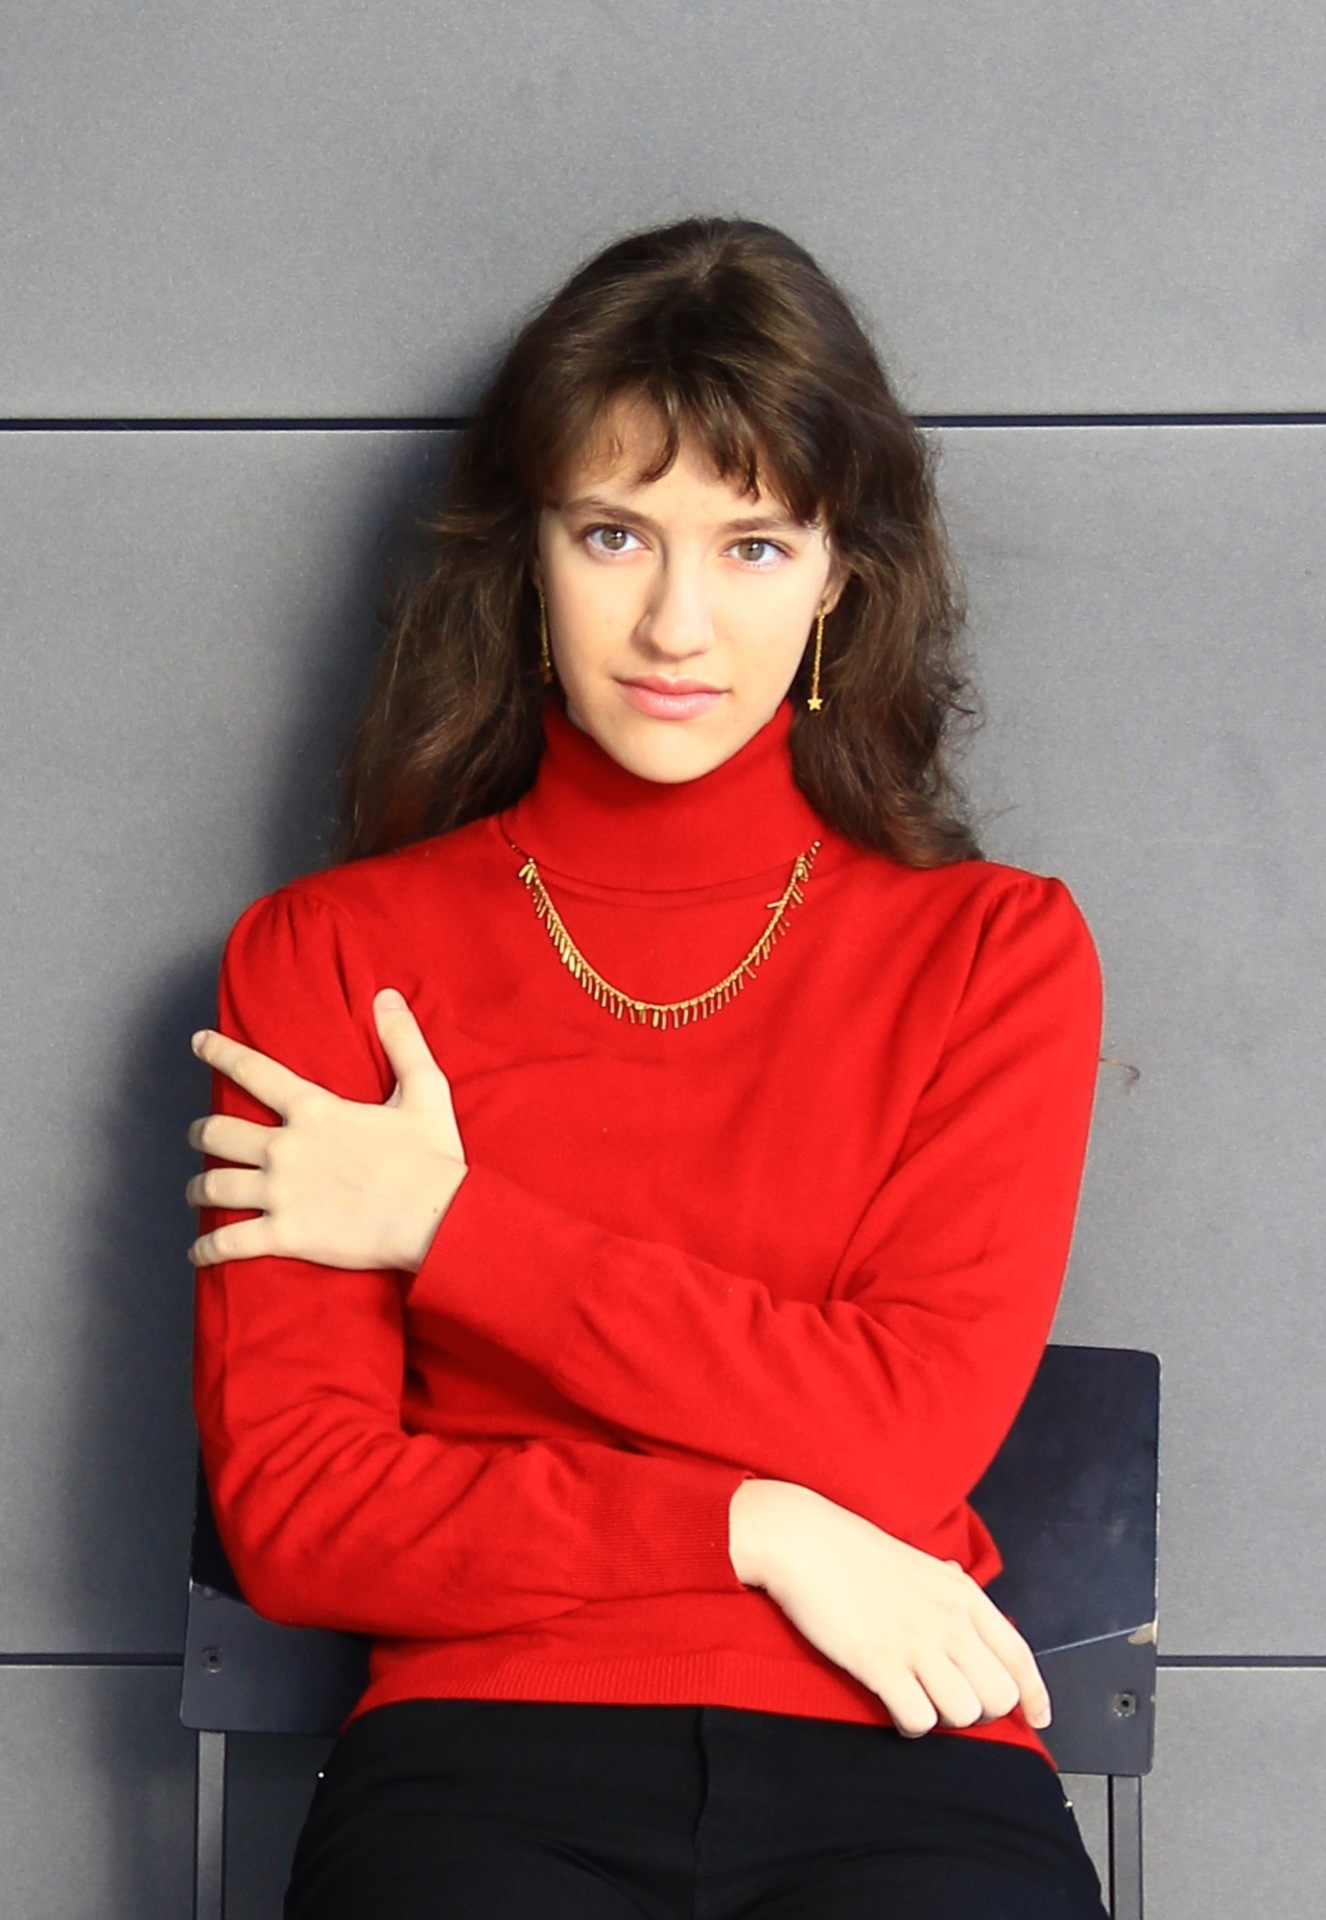 Alicia Ibanez Resian